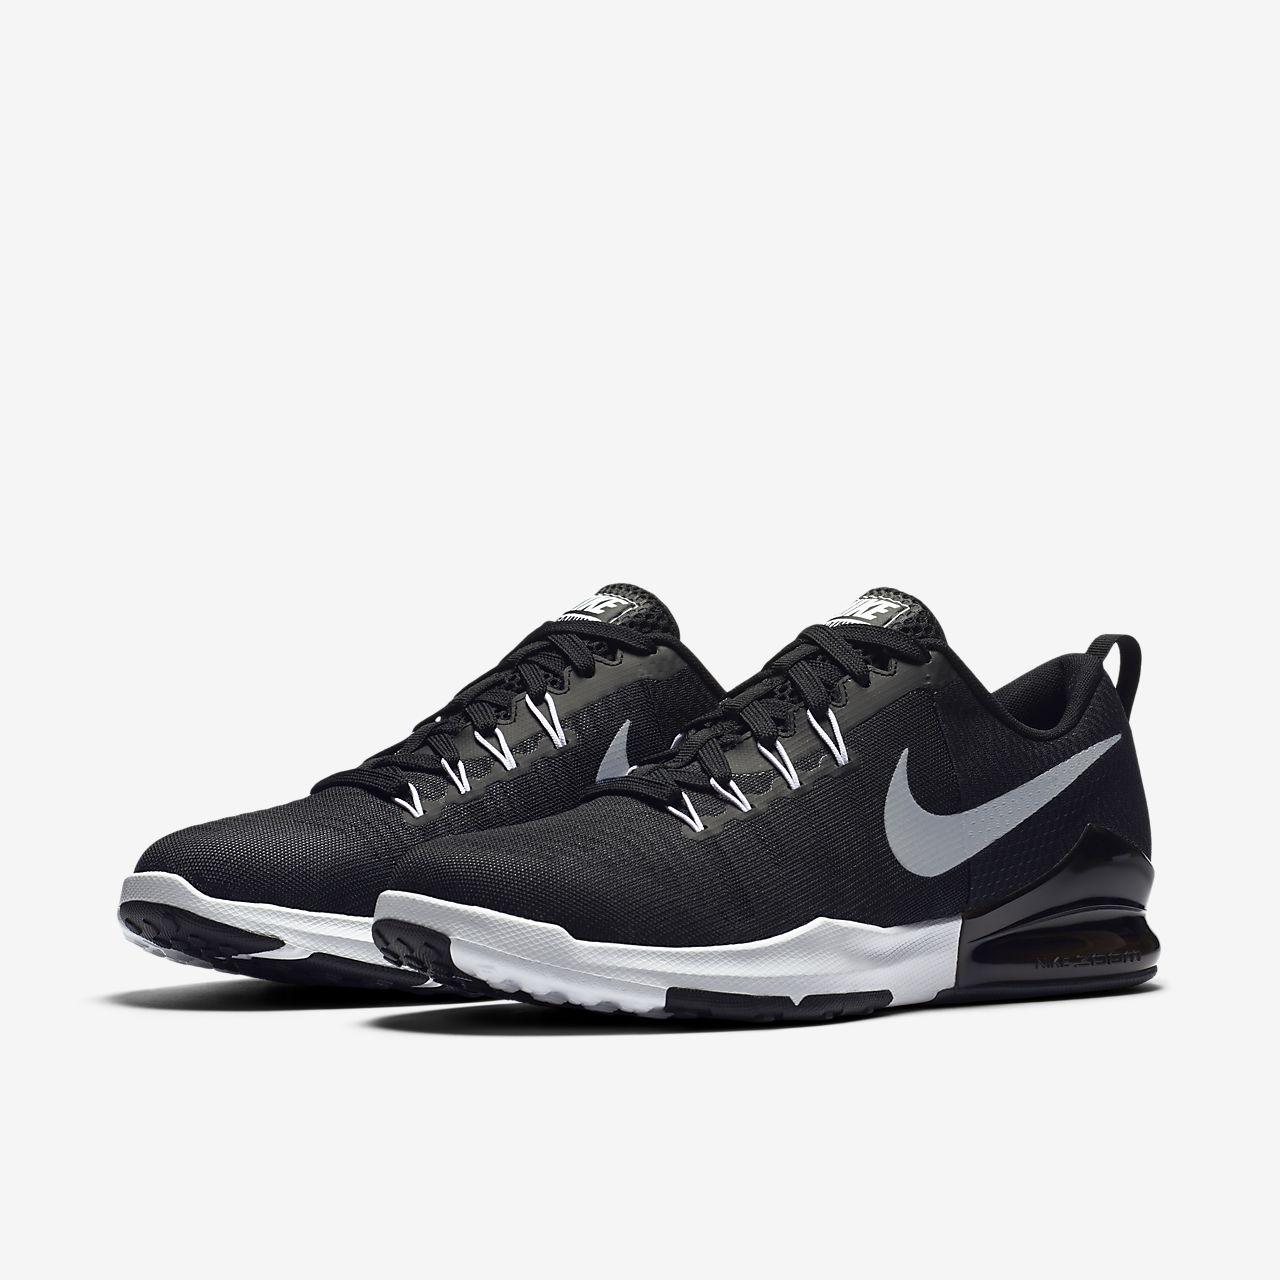 nike zoom train action mens training shoe